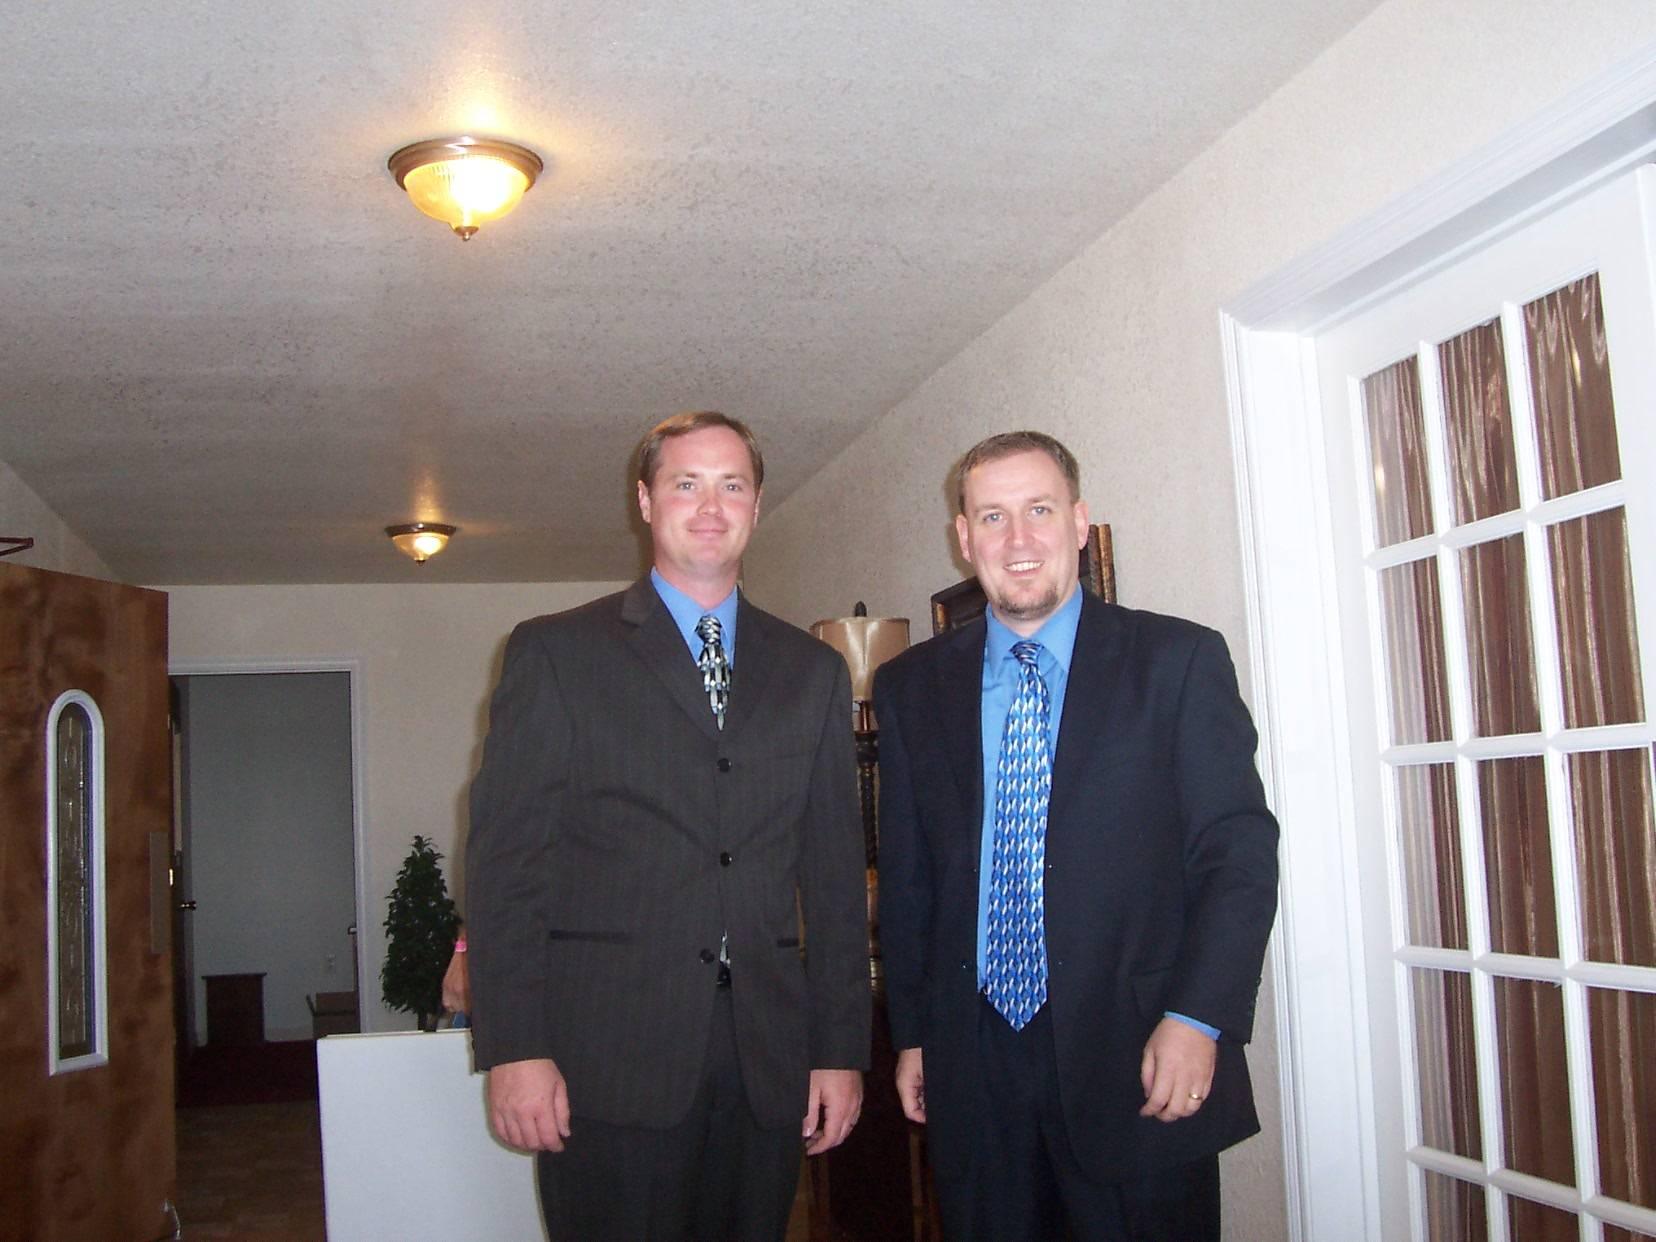 Pastor James Conner